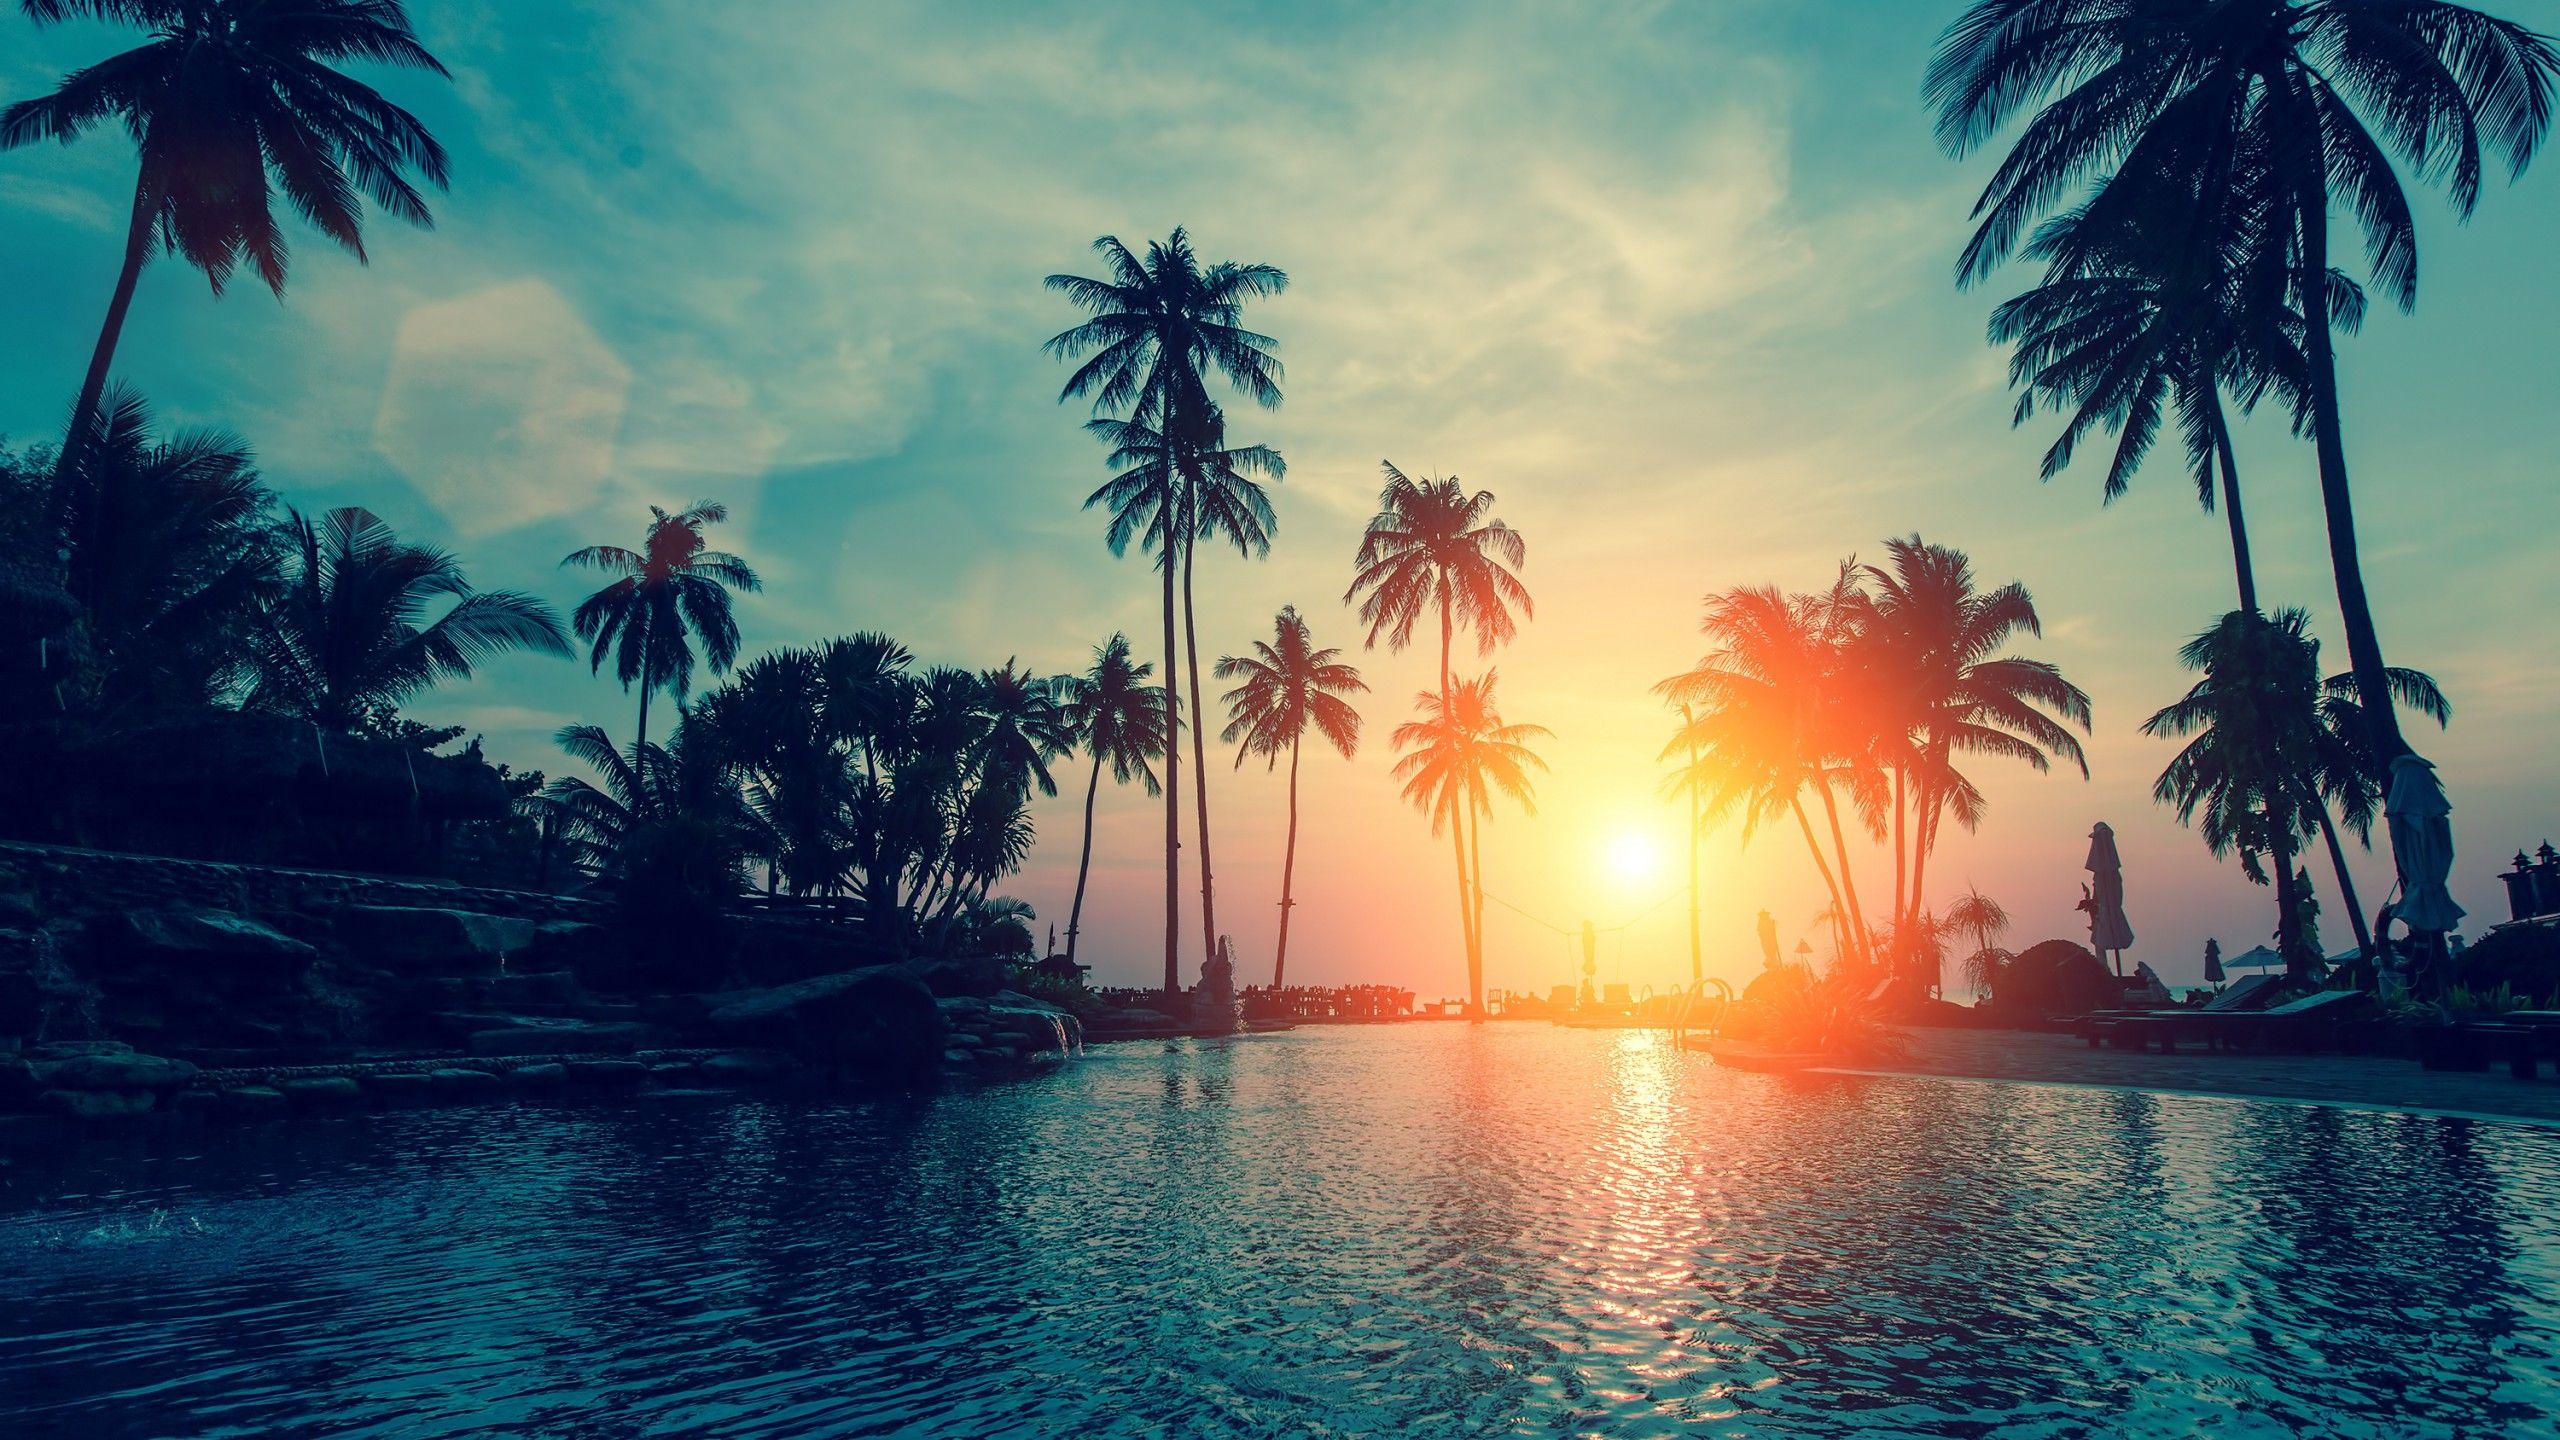 Sunset 2560x1440 Palm Trees Tropical Beach Hd Media File Pixelstalk Net Palm Trees Wallpaper Tree Hd Wallpaper Sunset Wallpaper